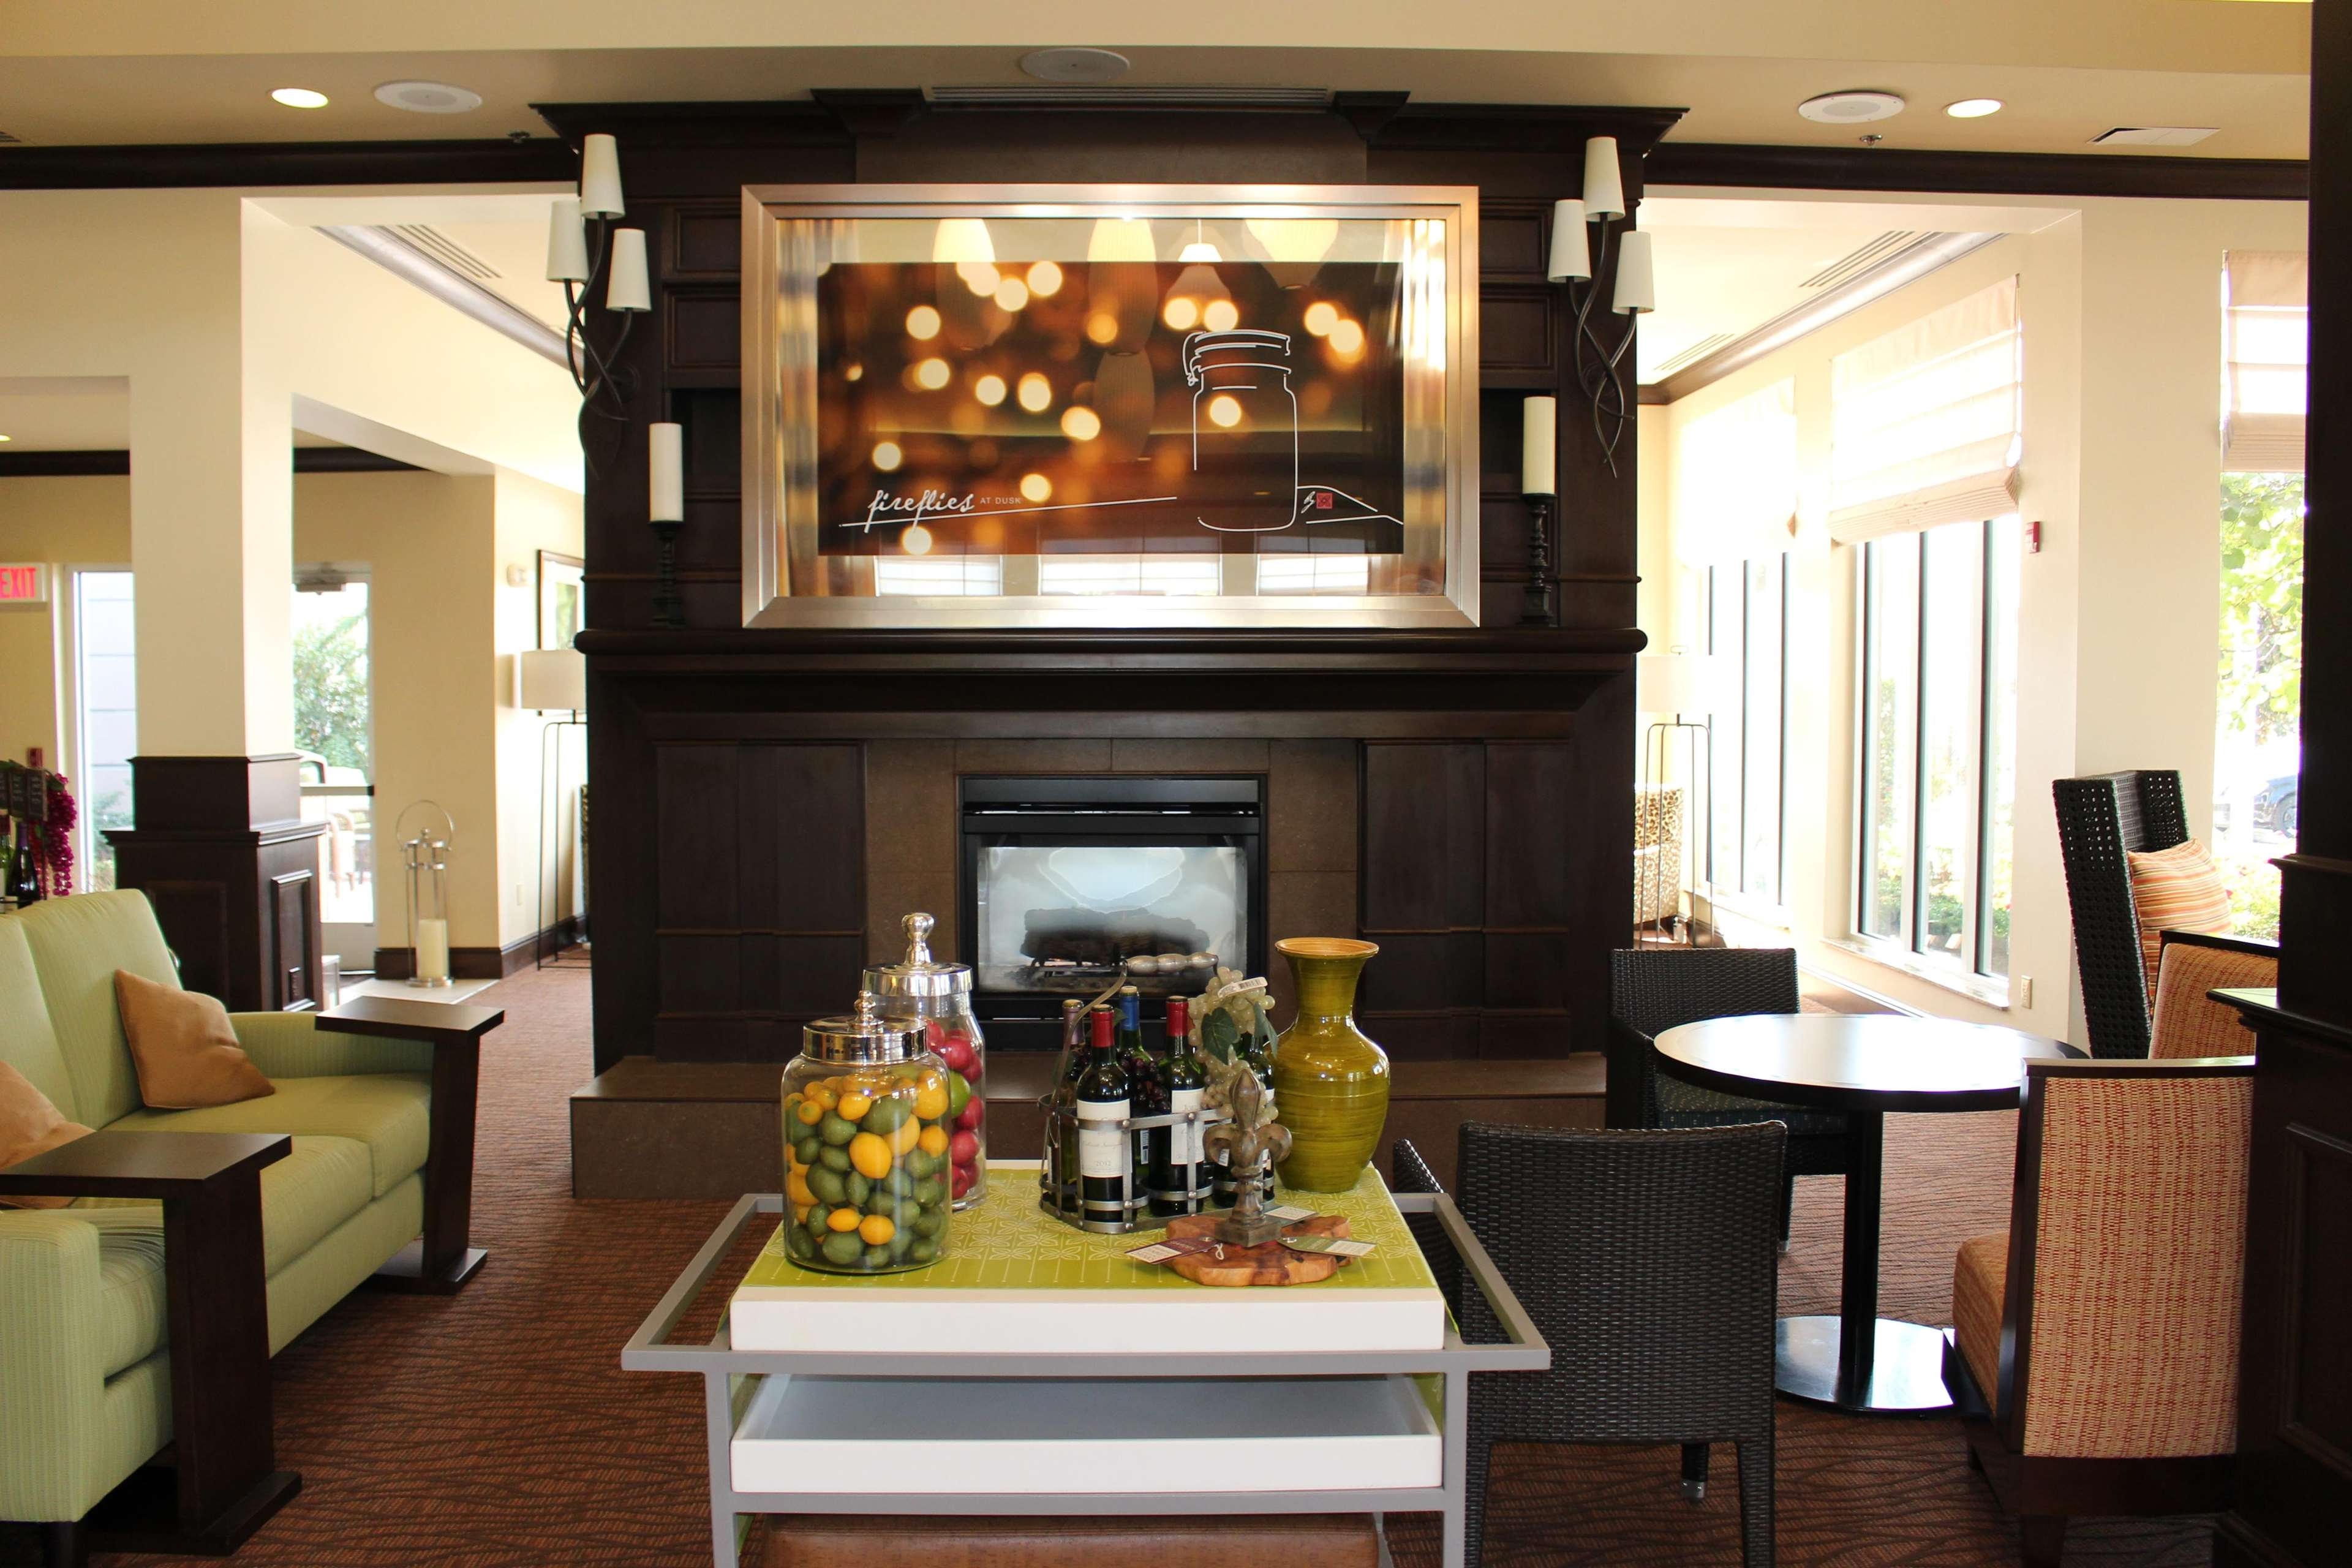 Hilton Garden Inn Clovis 520 West Shaw Ave Clovis, CA Hotels U0026 Motels    MapQuest